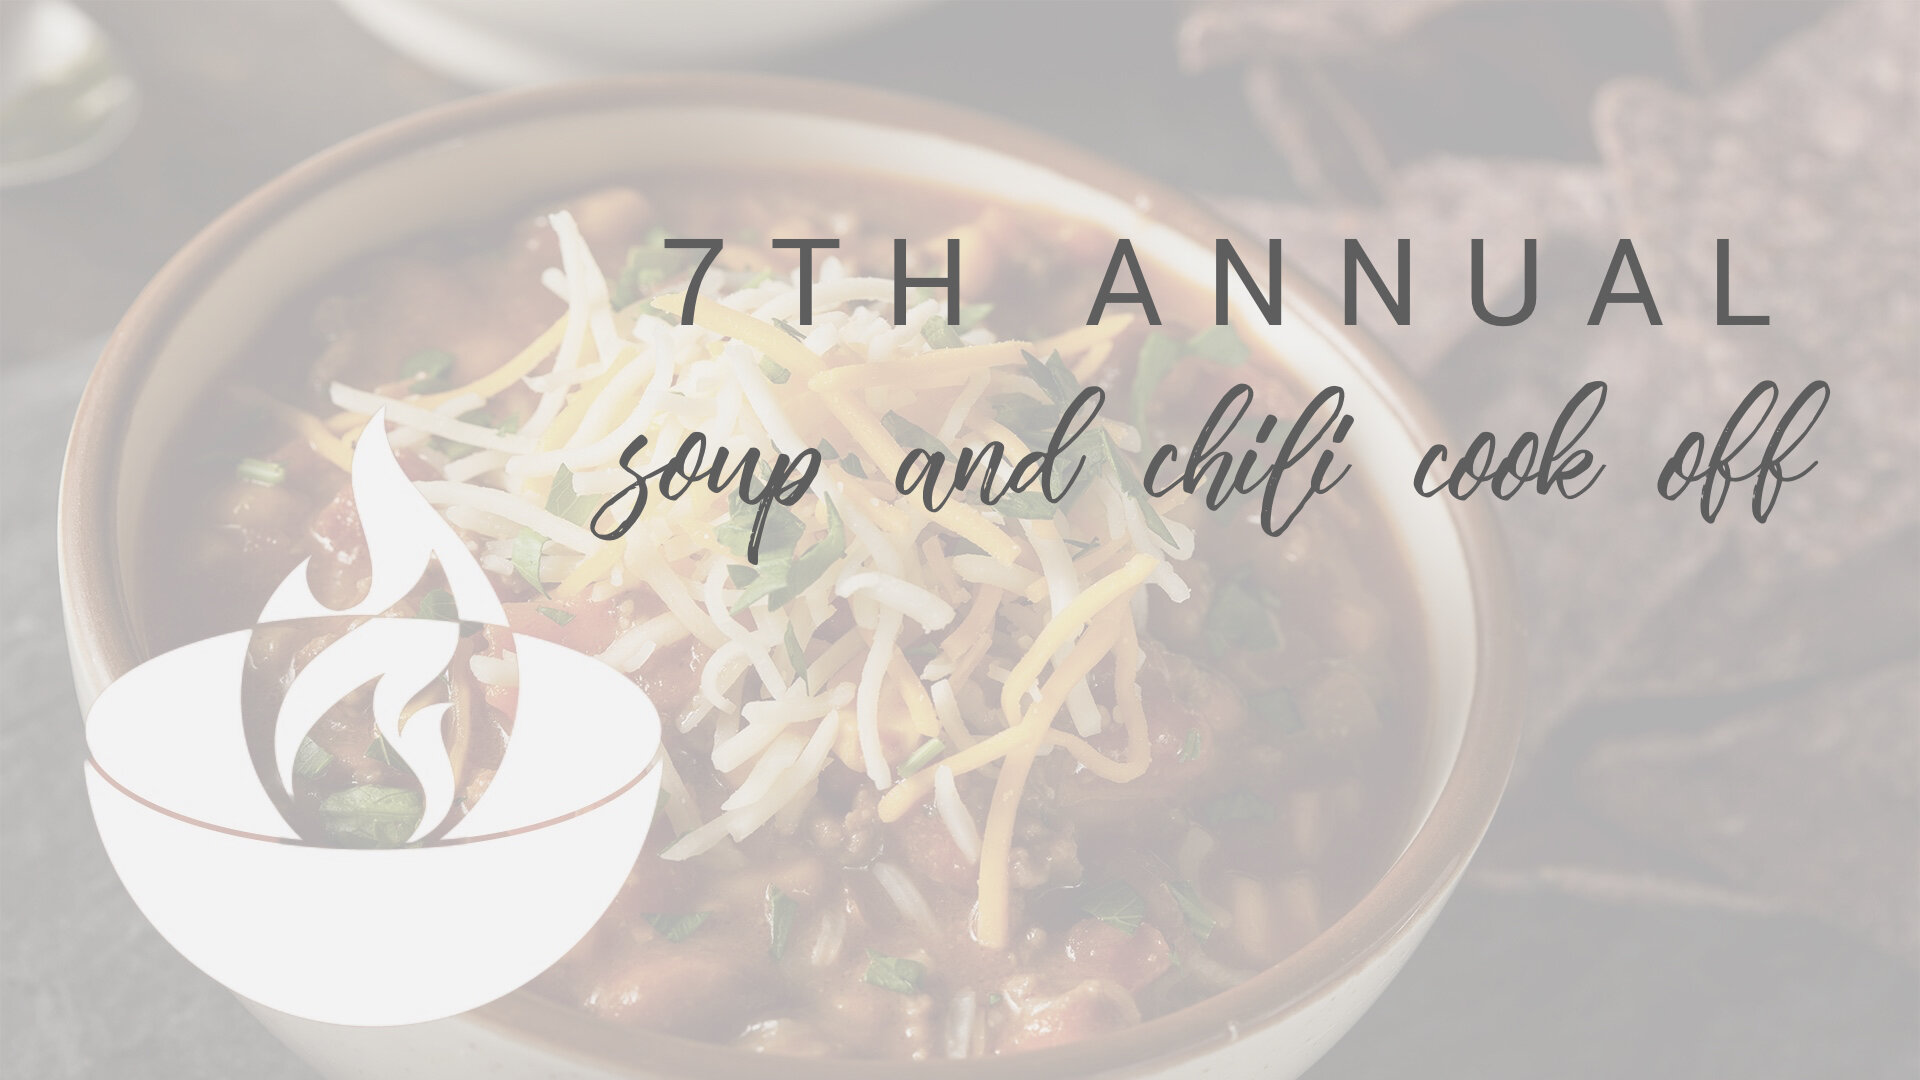 Chili Cook Off 2019.001.jpeg